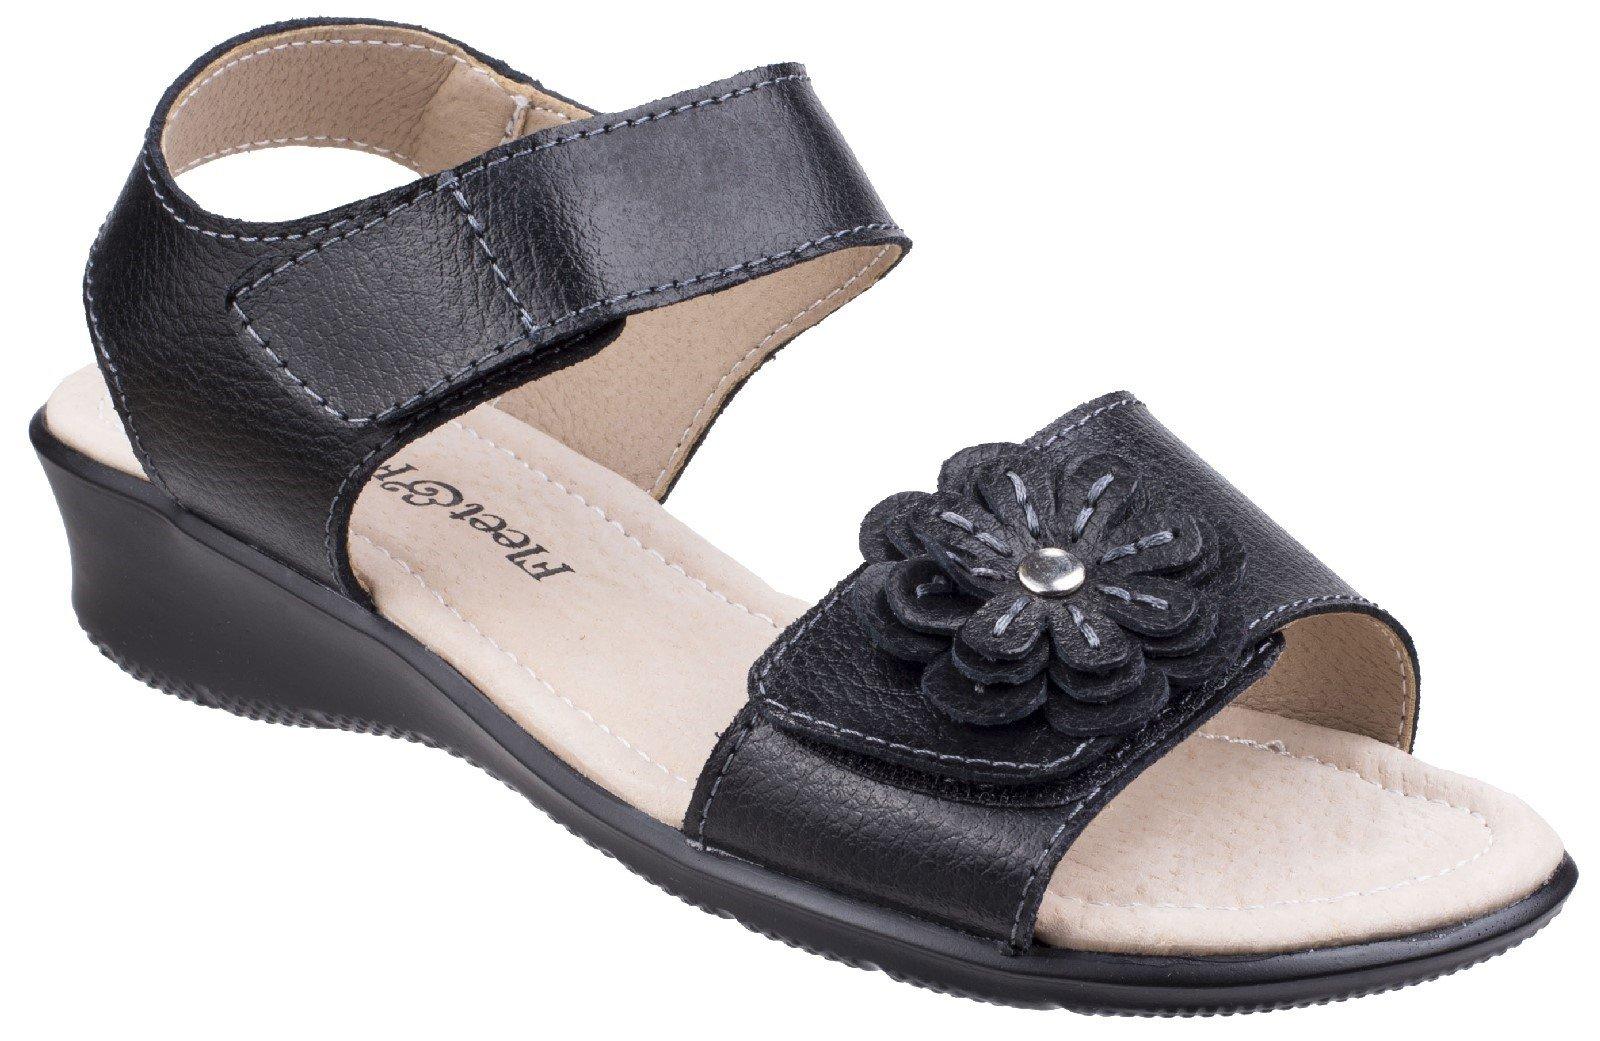 Fleet & Foster Women's Sapphire Touch Sandal Various Colours 26299 - Black 3